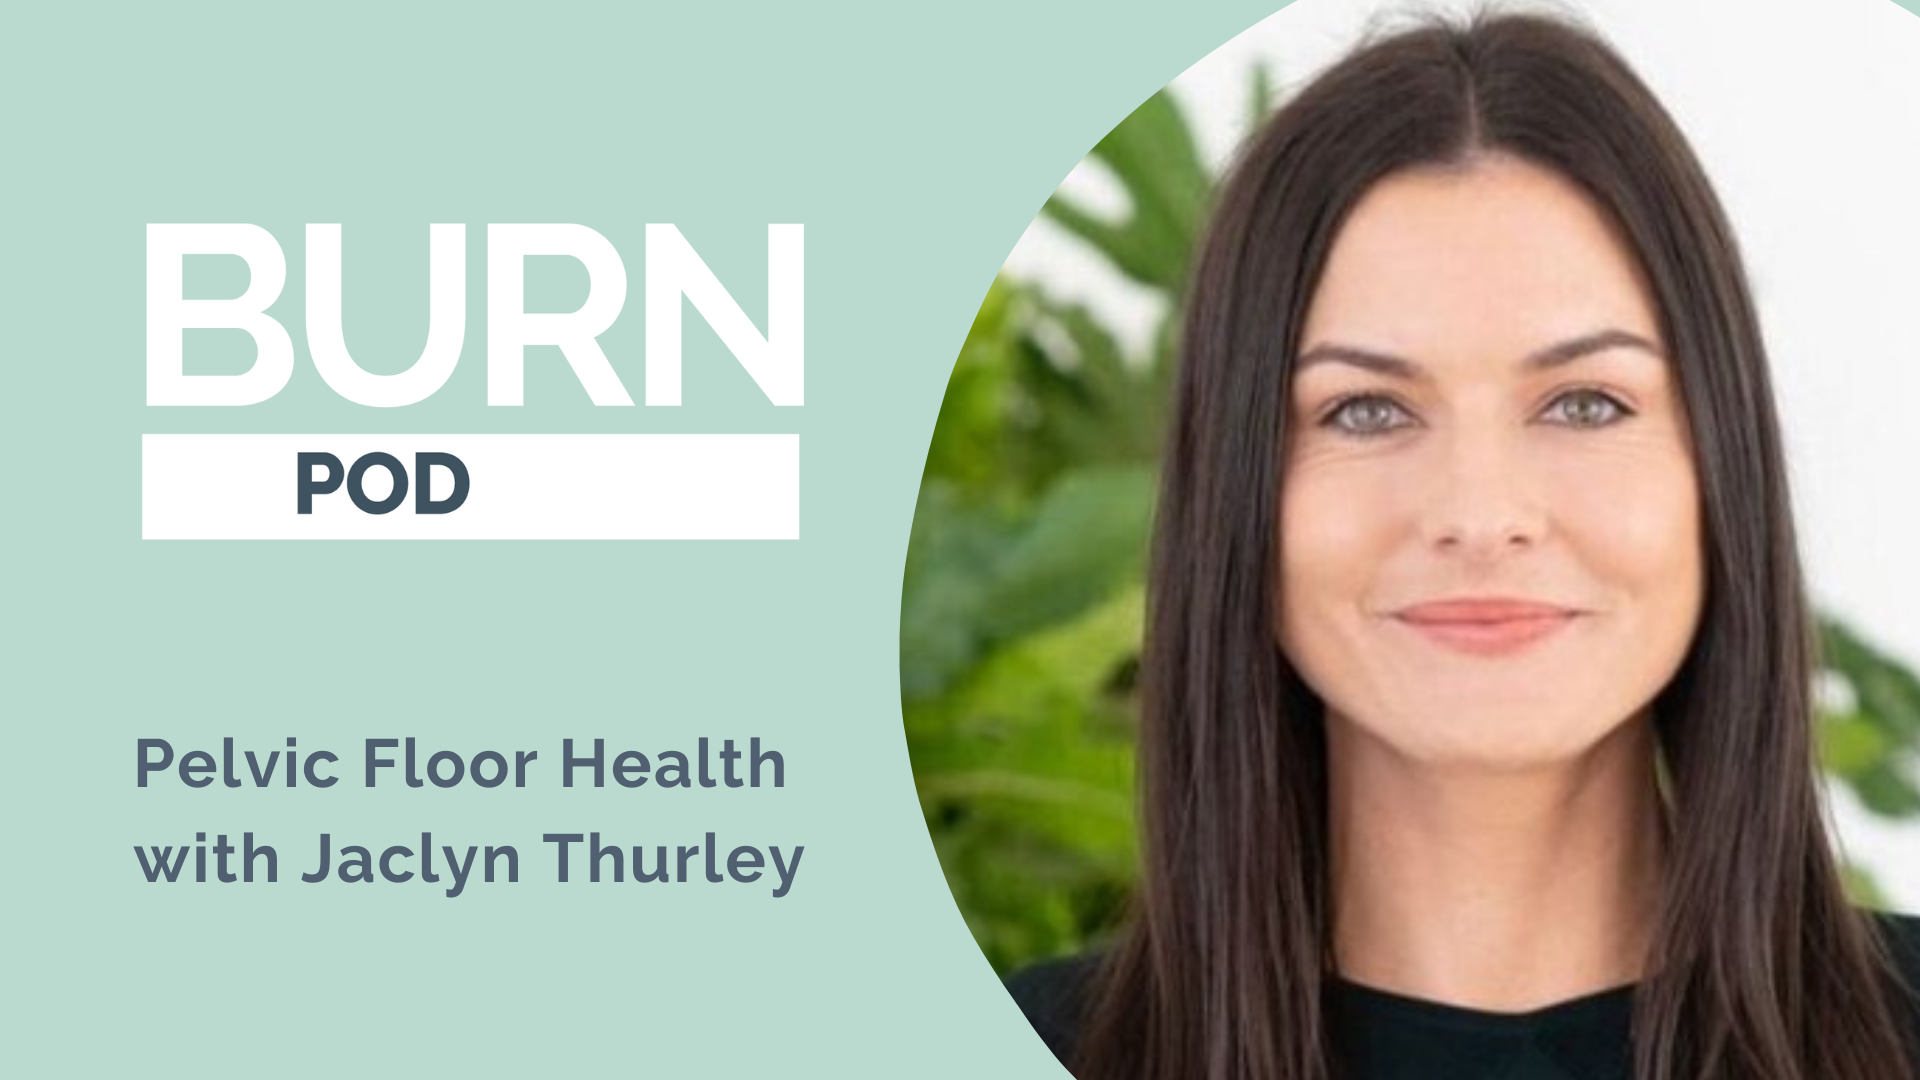 Burn Pod Pelvic Floor Health -Women's holistic health - The pelvic Studio